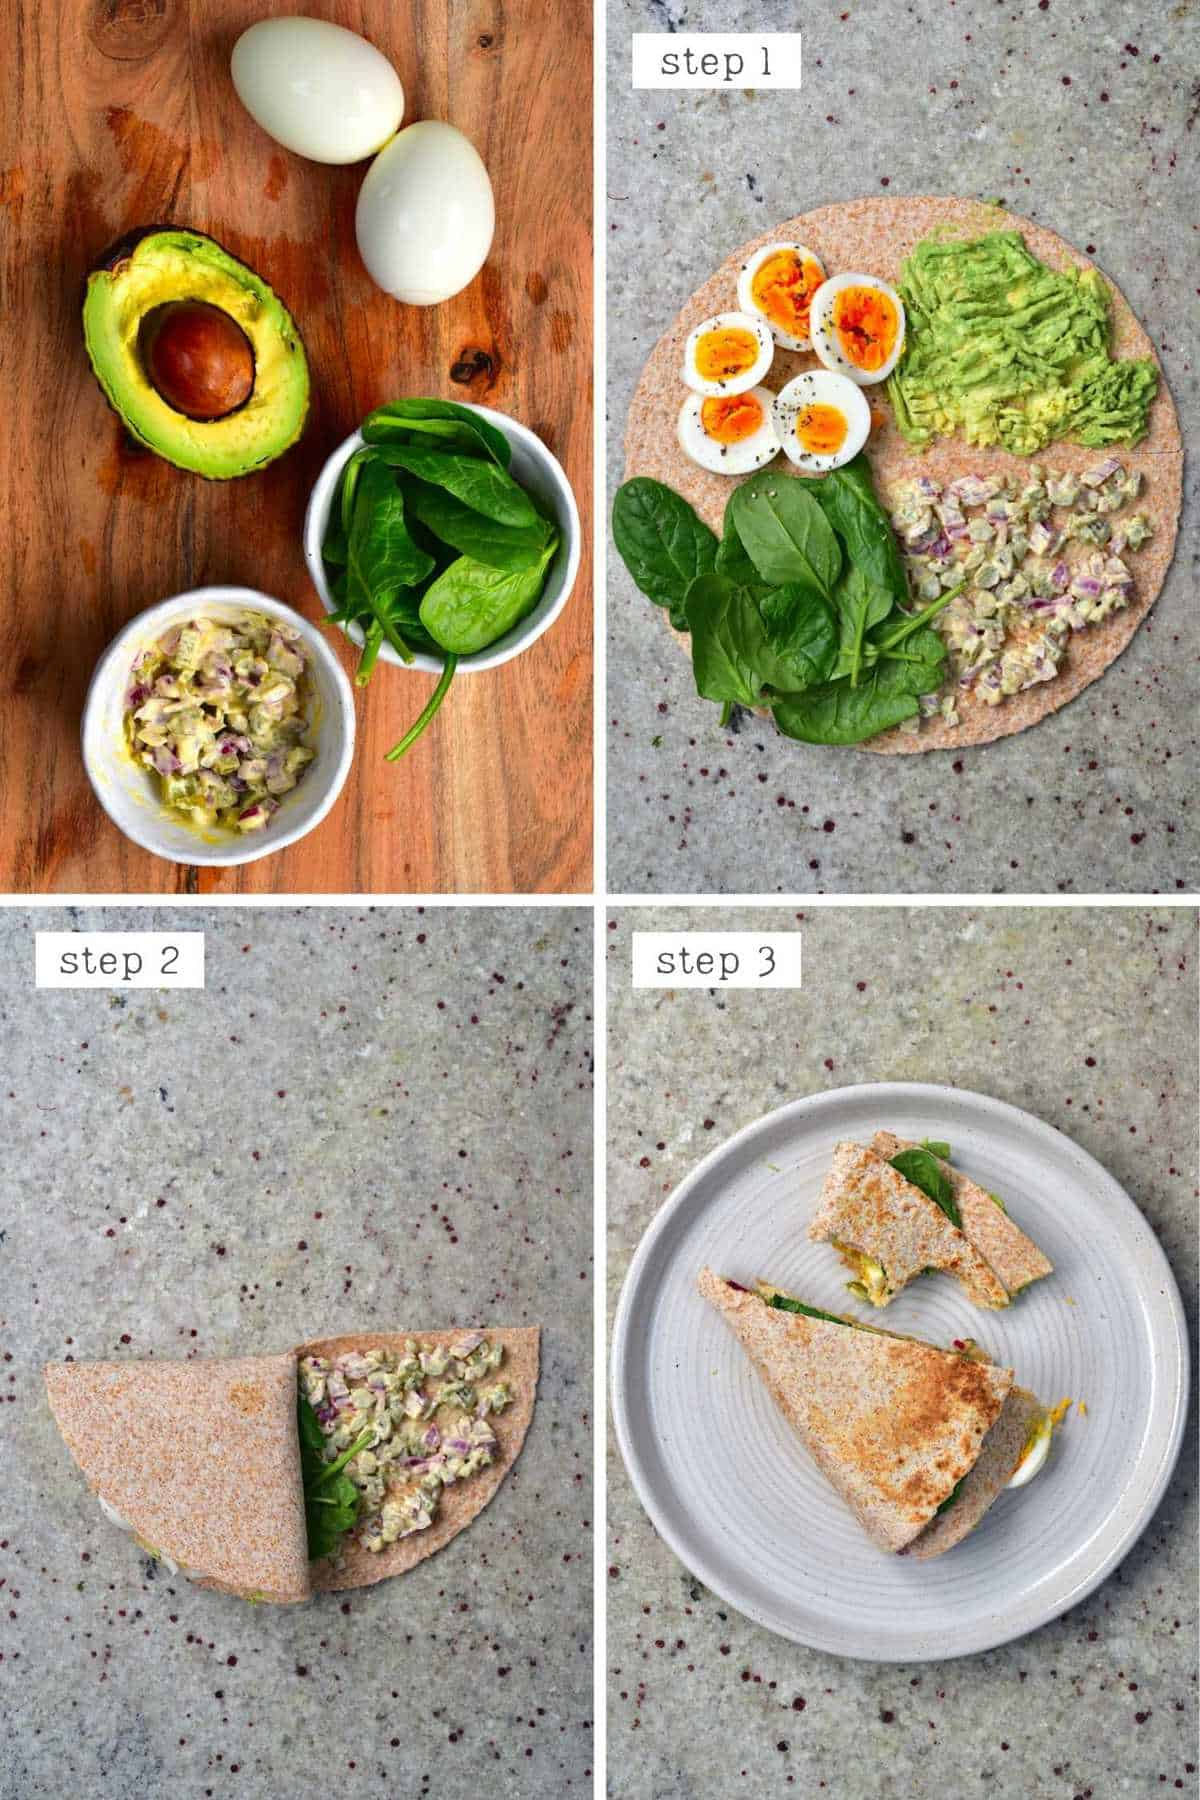 Steps for making potato breakfast tortilla